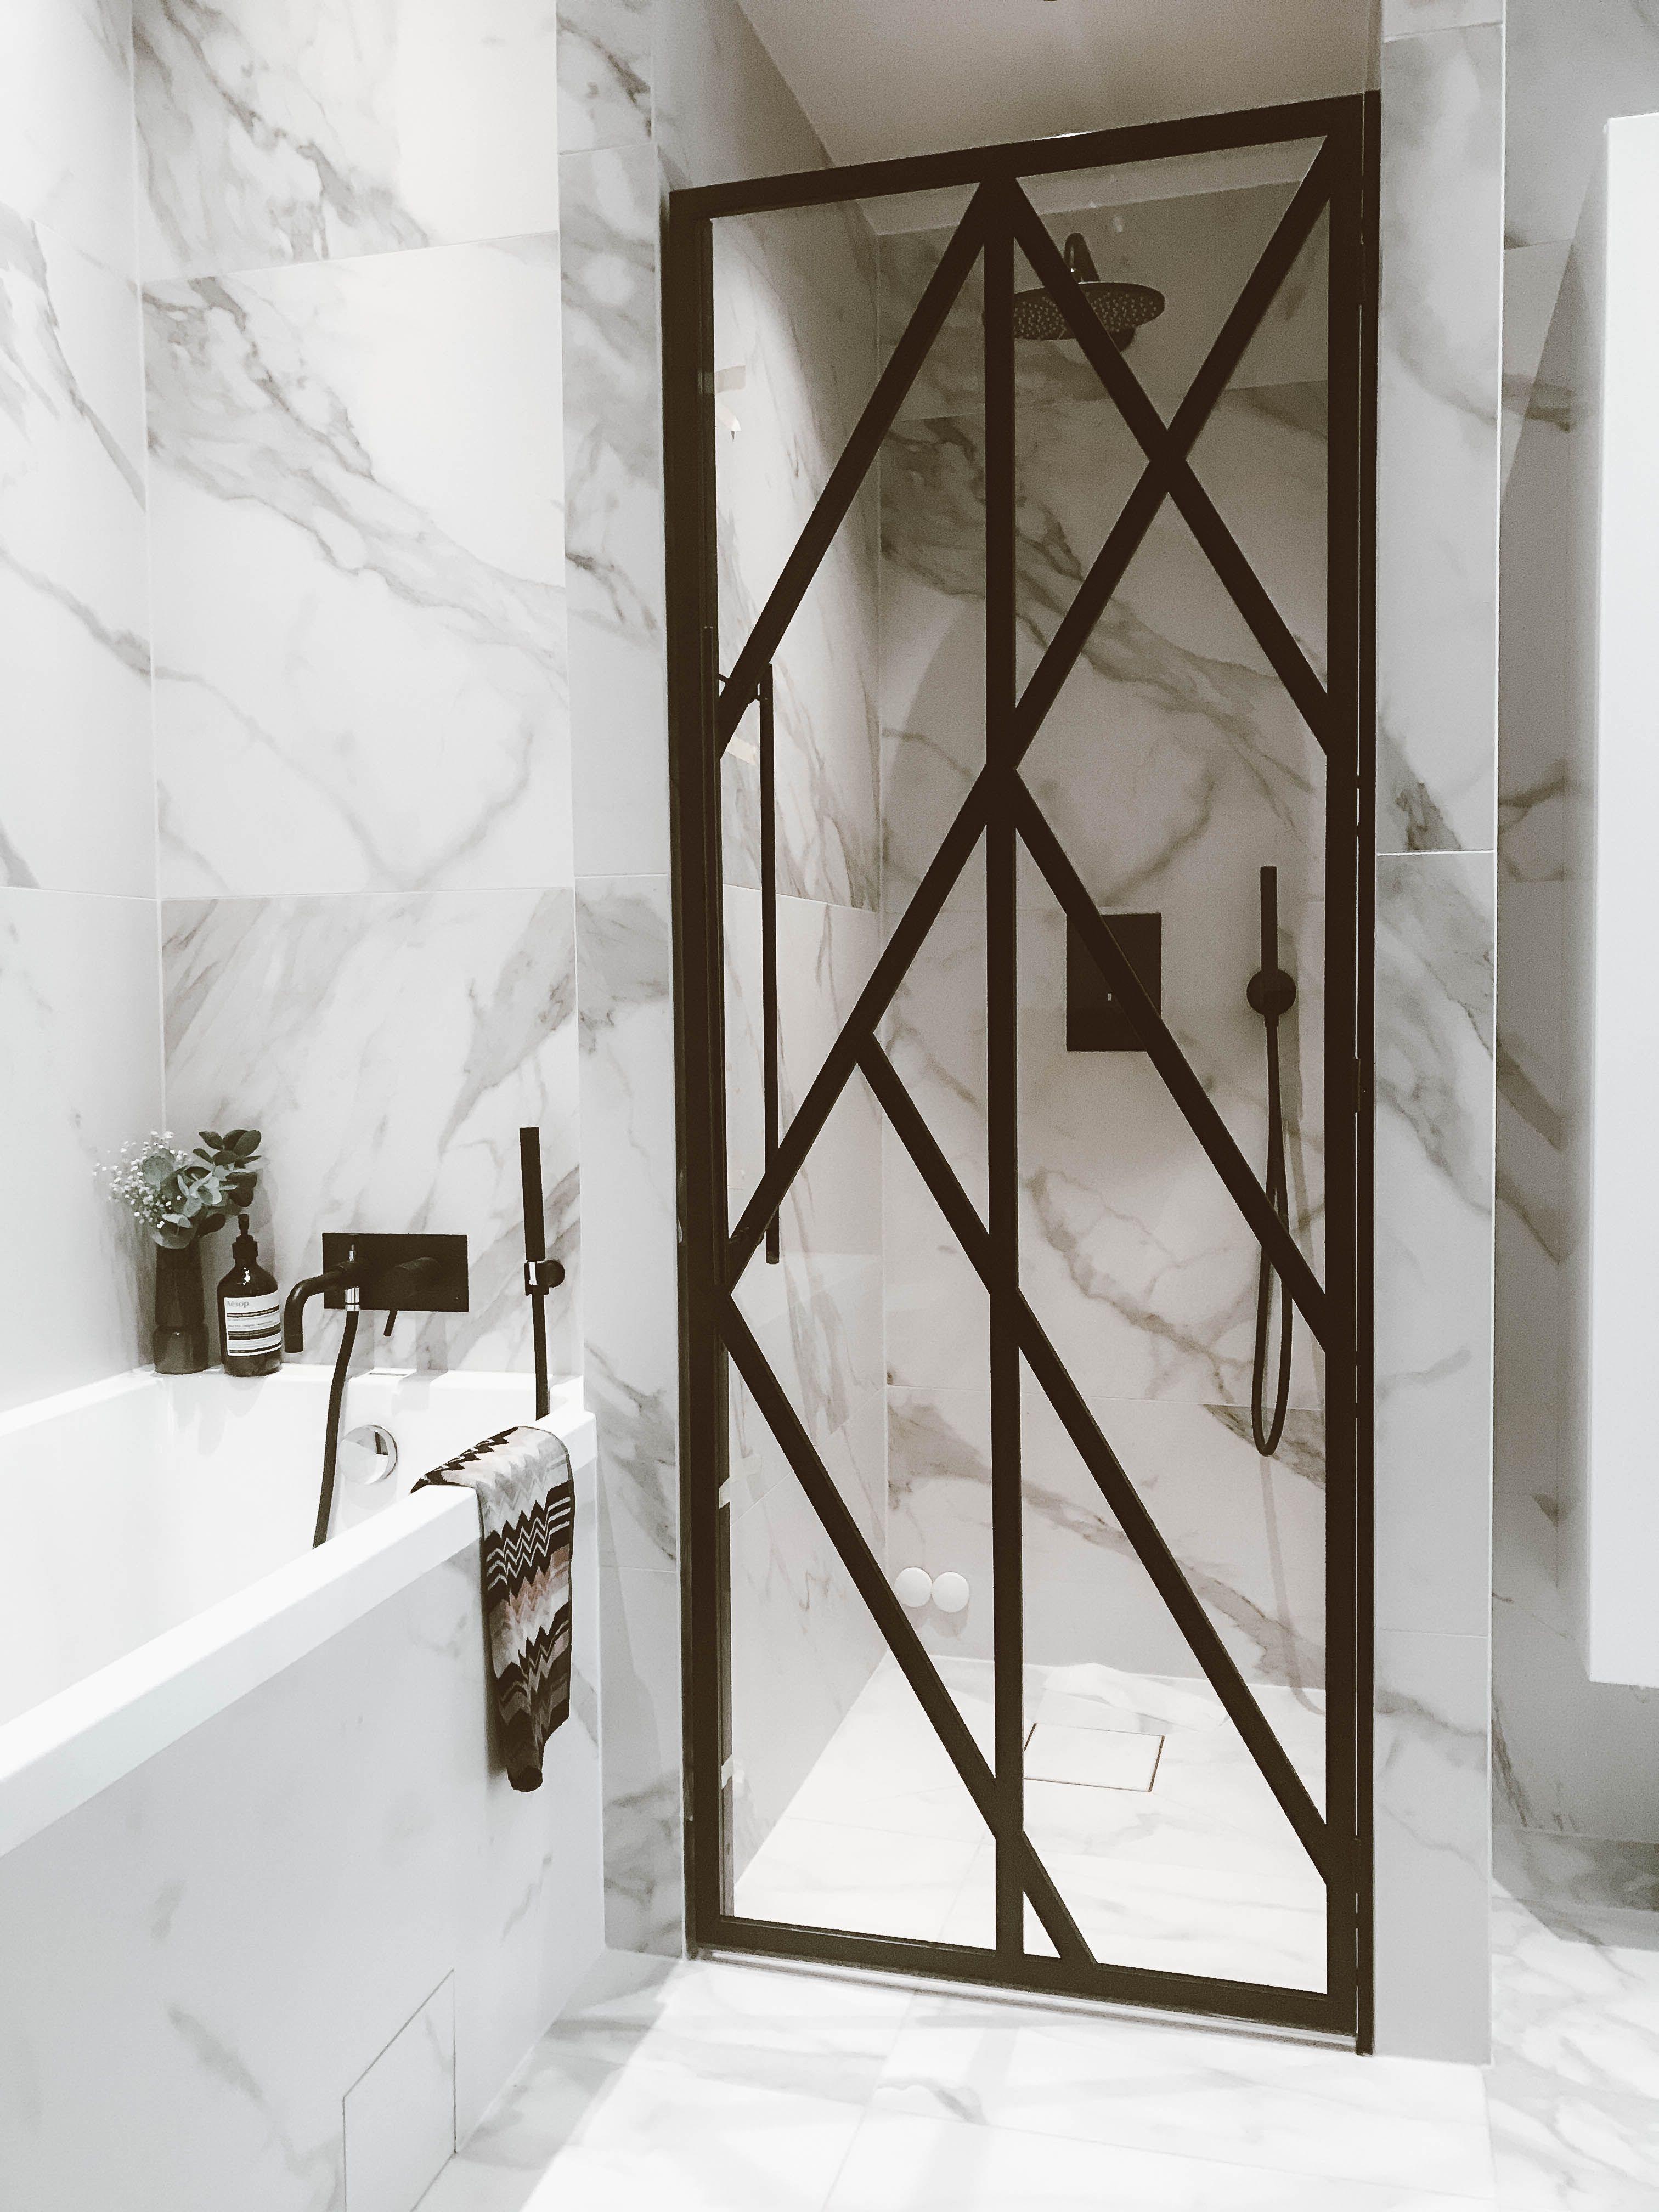 Lene orvik x bathroom decorette art deco pinterest bath